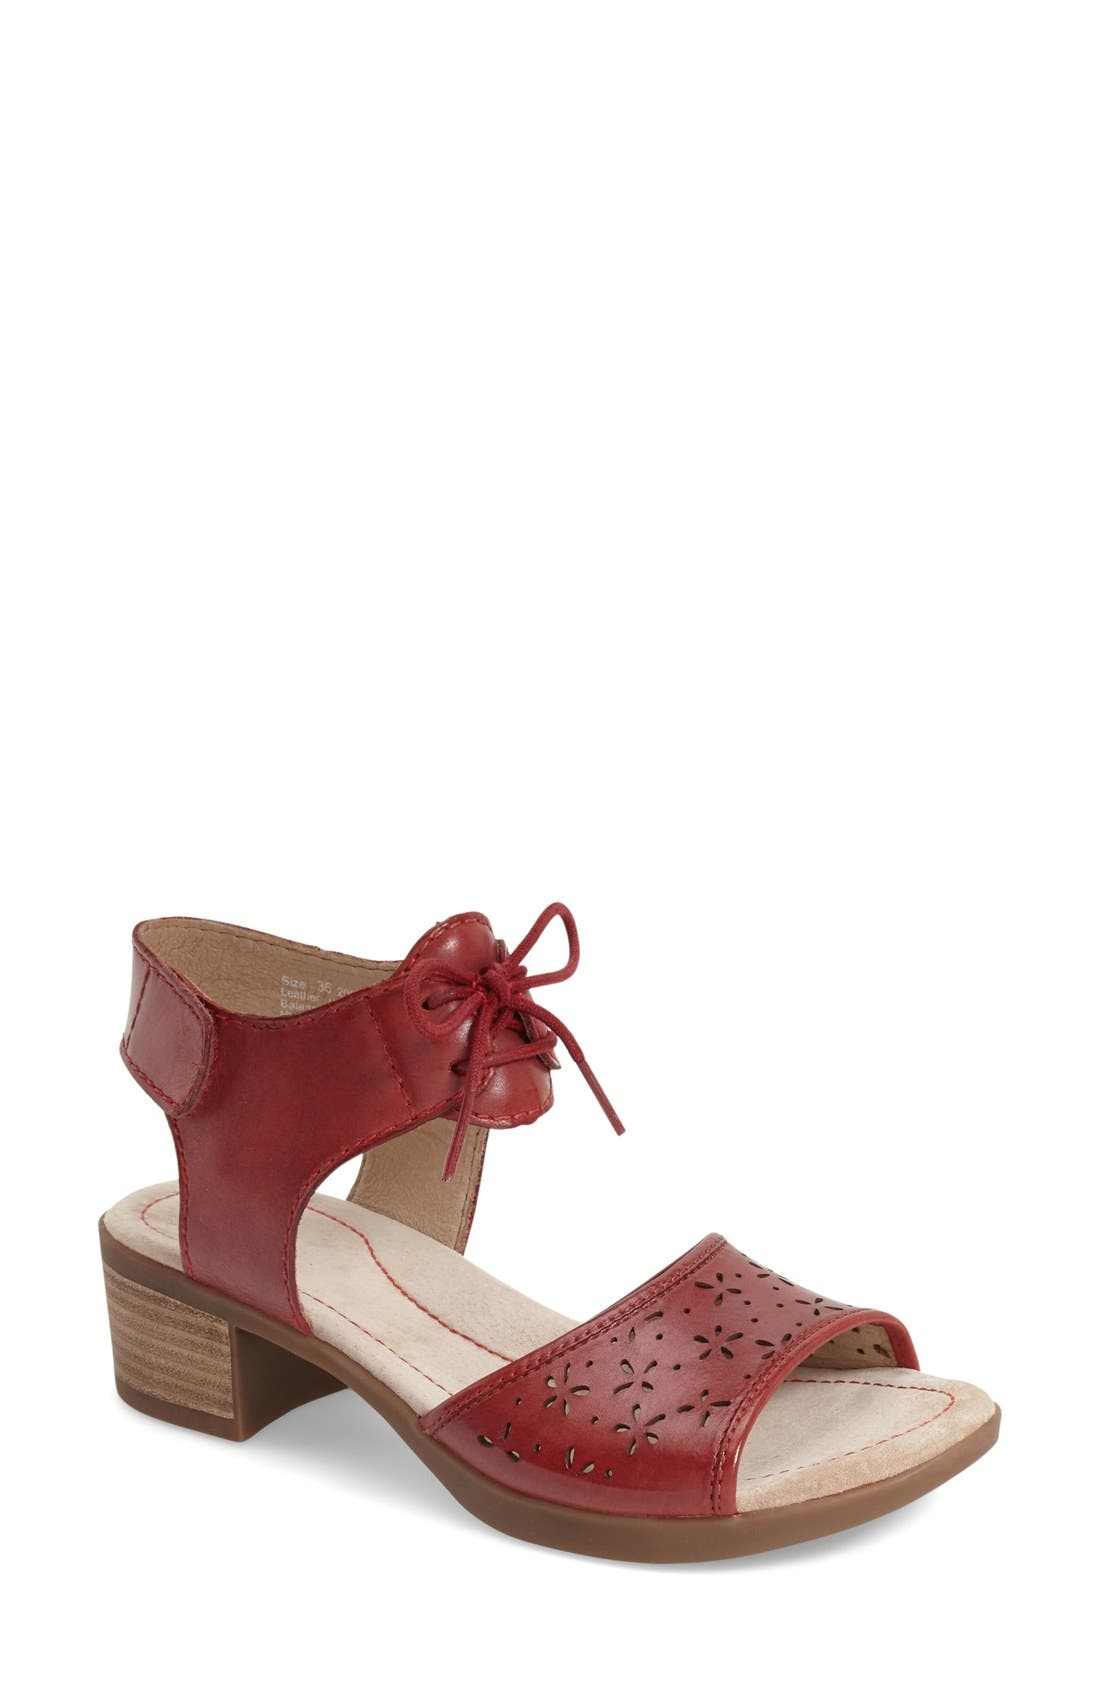 'Liz' Lace-Up Block Heel Sandal,                         Main,                         color, Red Antiqued Leather